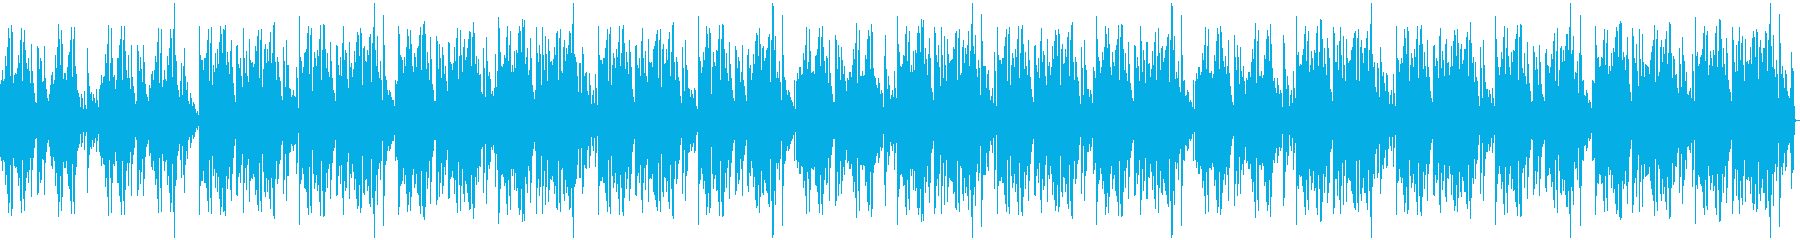 Japan×LoFi×Trap Beatの再生済みの波形